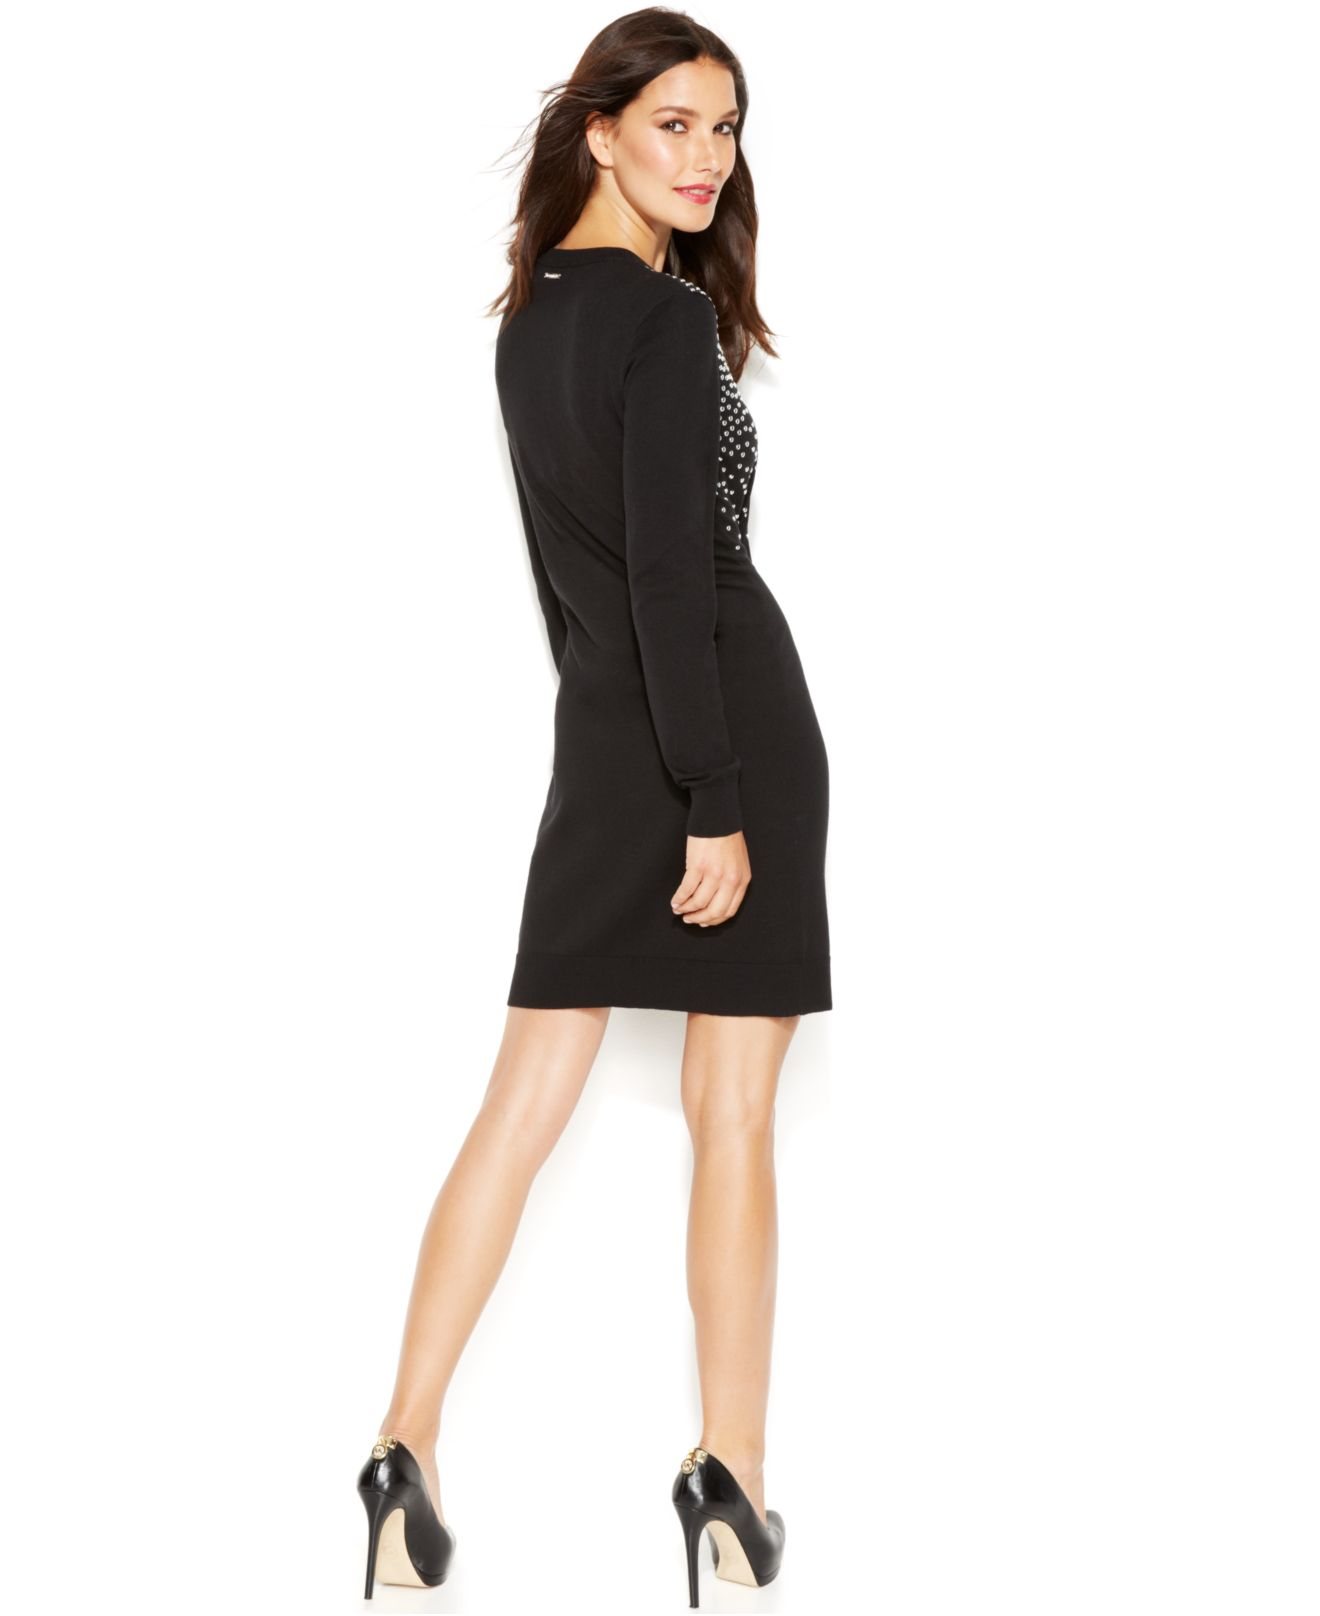 ca0ad542dc2 Lyst - Michael Kors Michael Petite Long-Sleeve Studded Sweater Dress ...